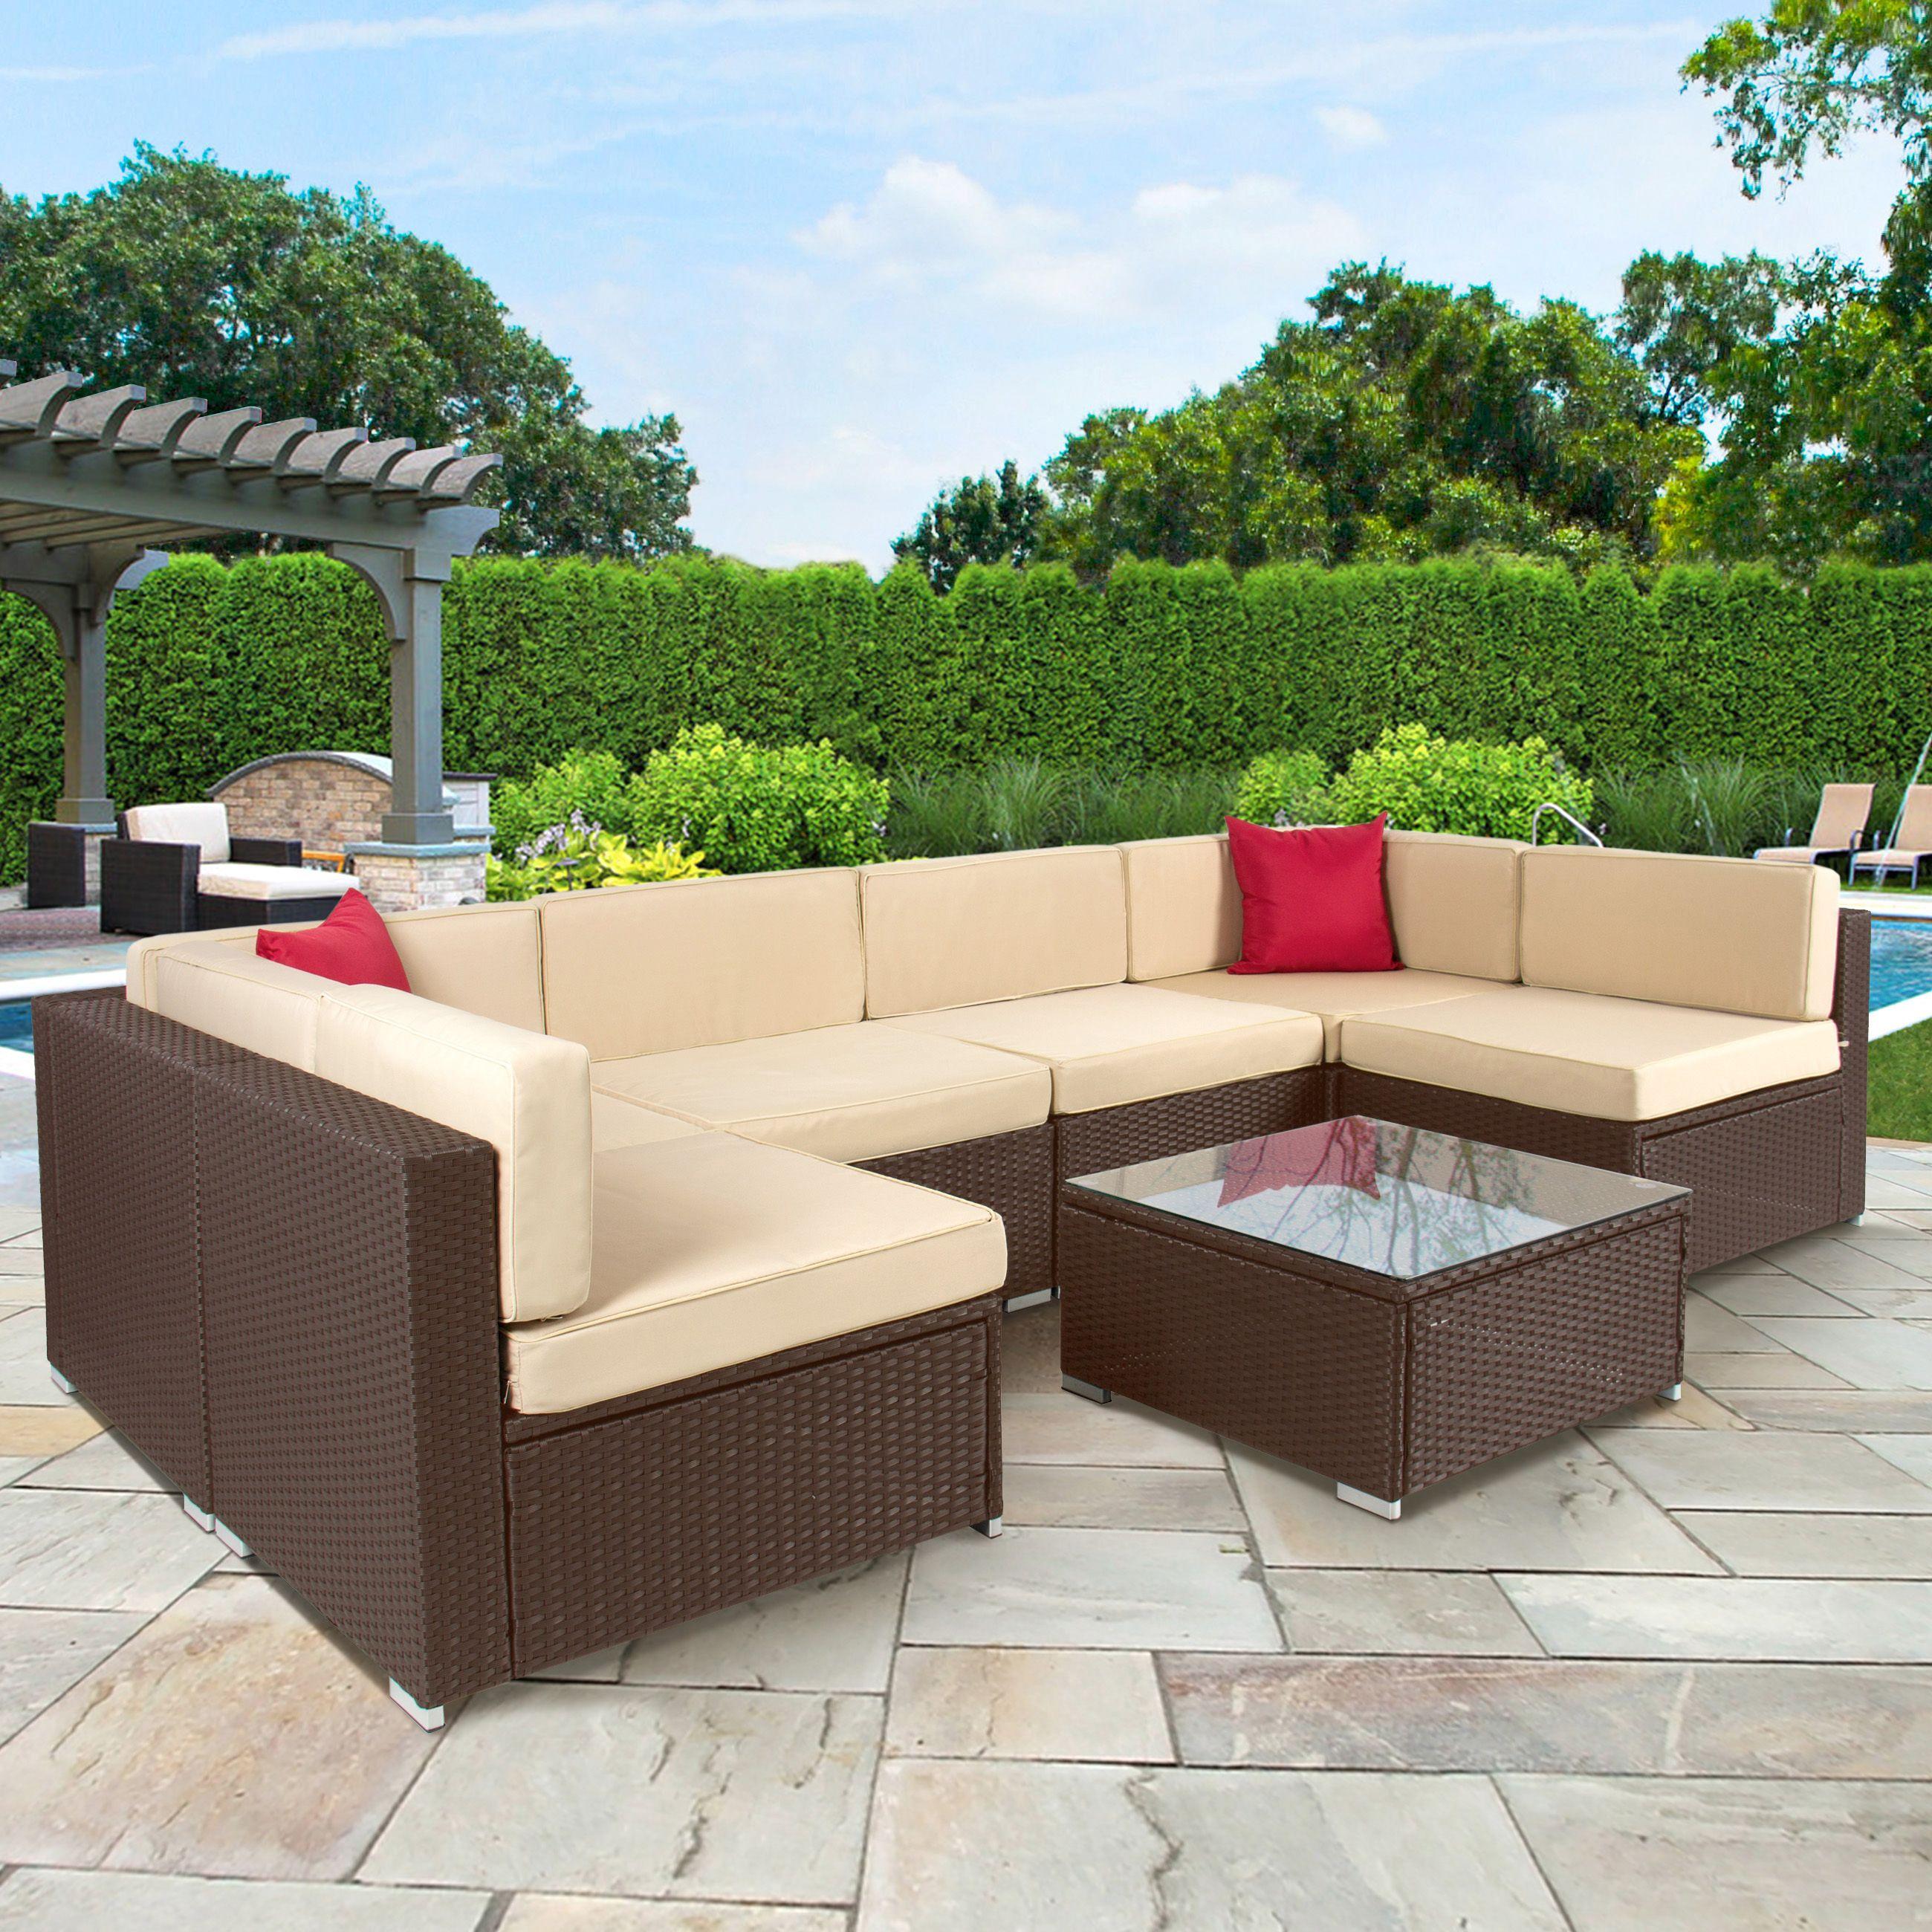 Outdoor Furniture Corner Seating Modern Italian Check More At Http Searchfororangecountyhomes